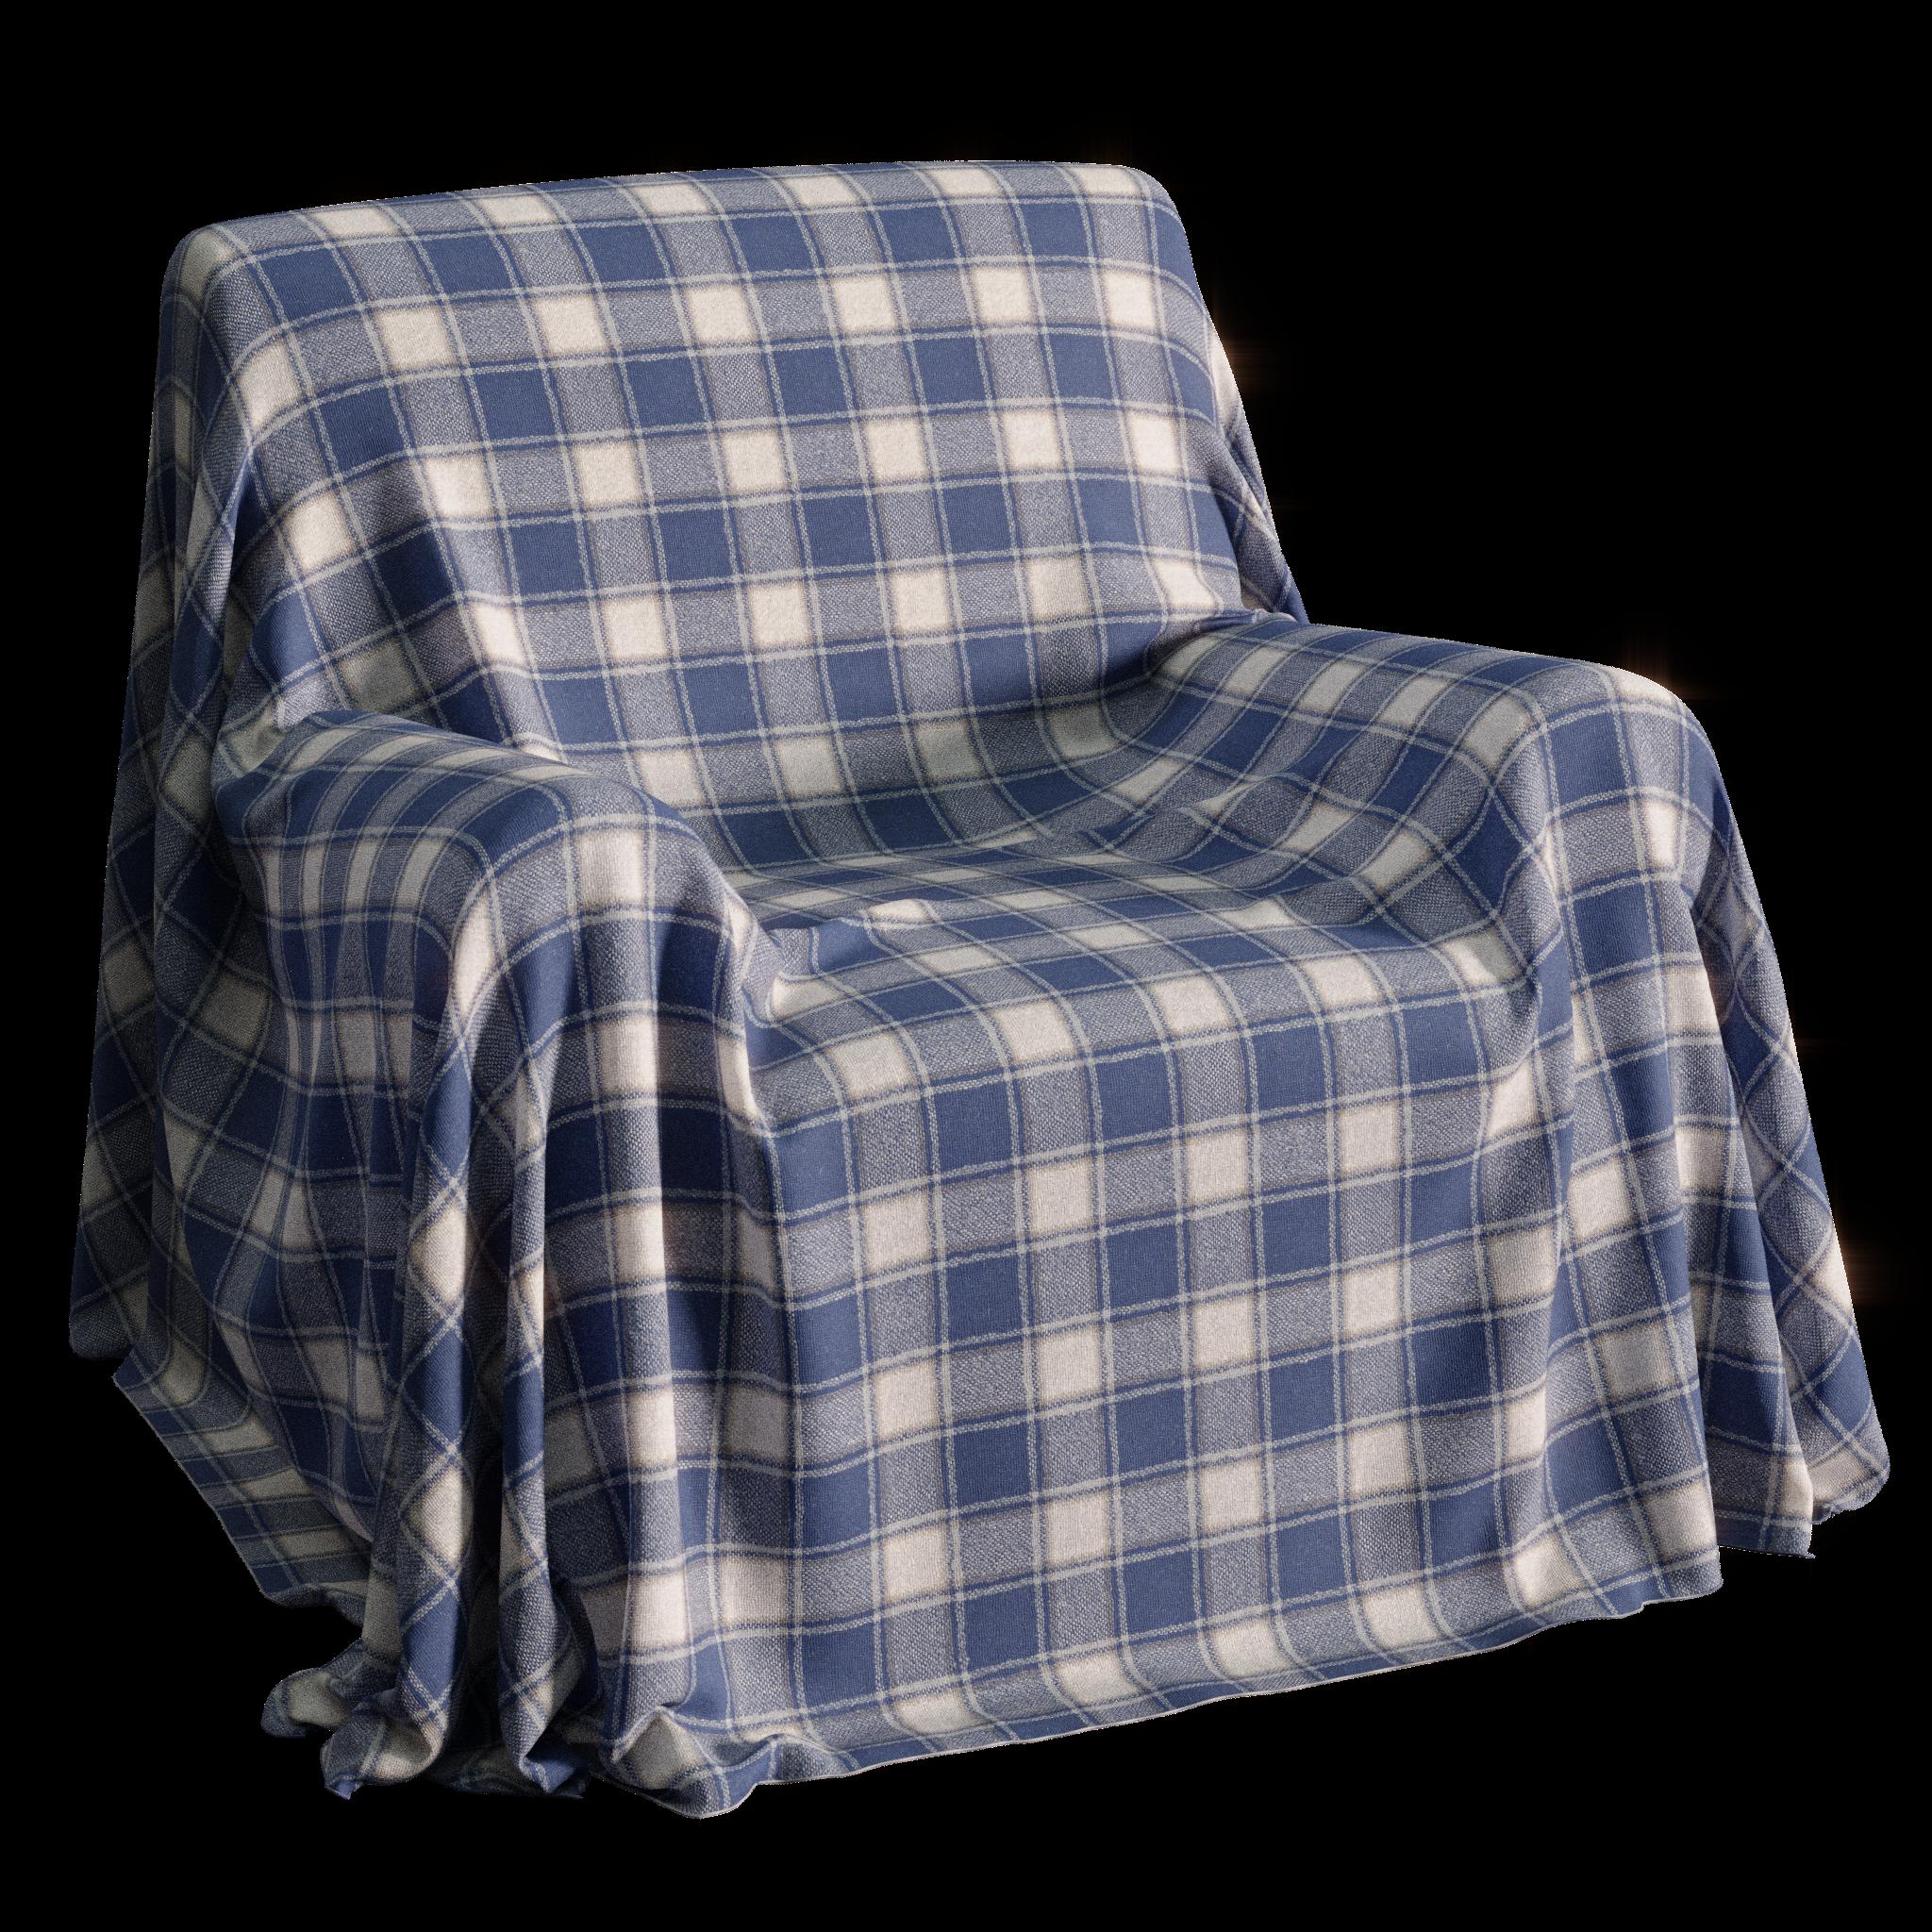 Blanket1.png